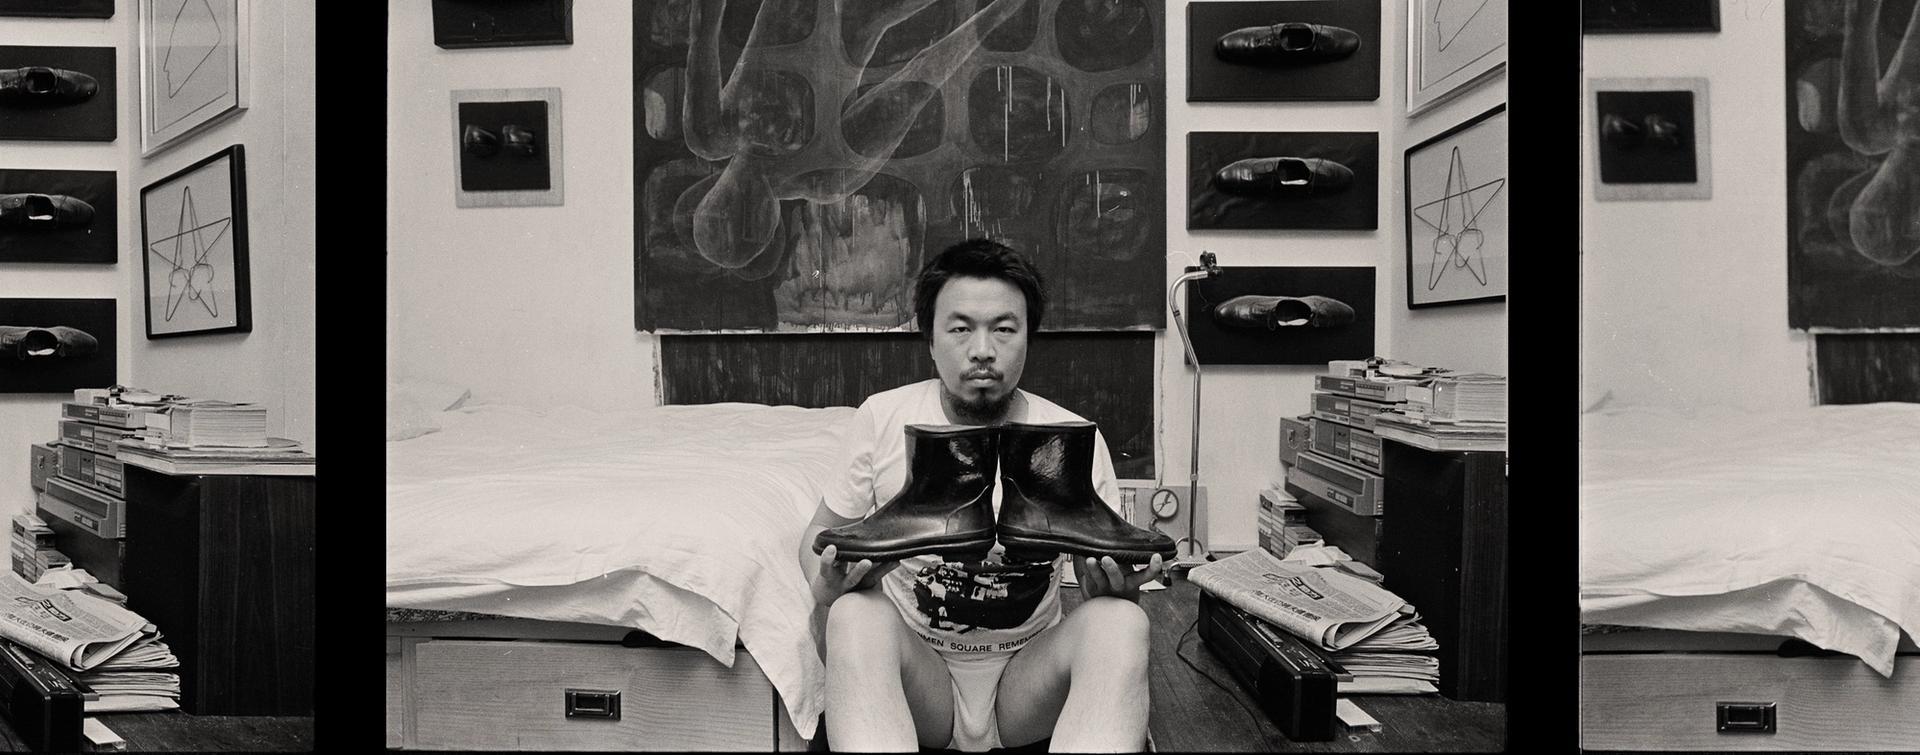 A still from one of Ai Weiwei's films ©Ai Weiwei